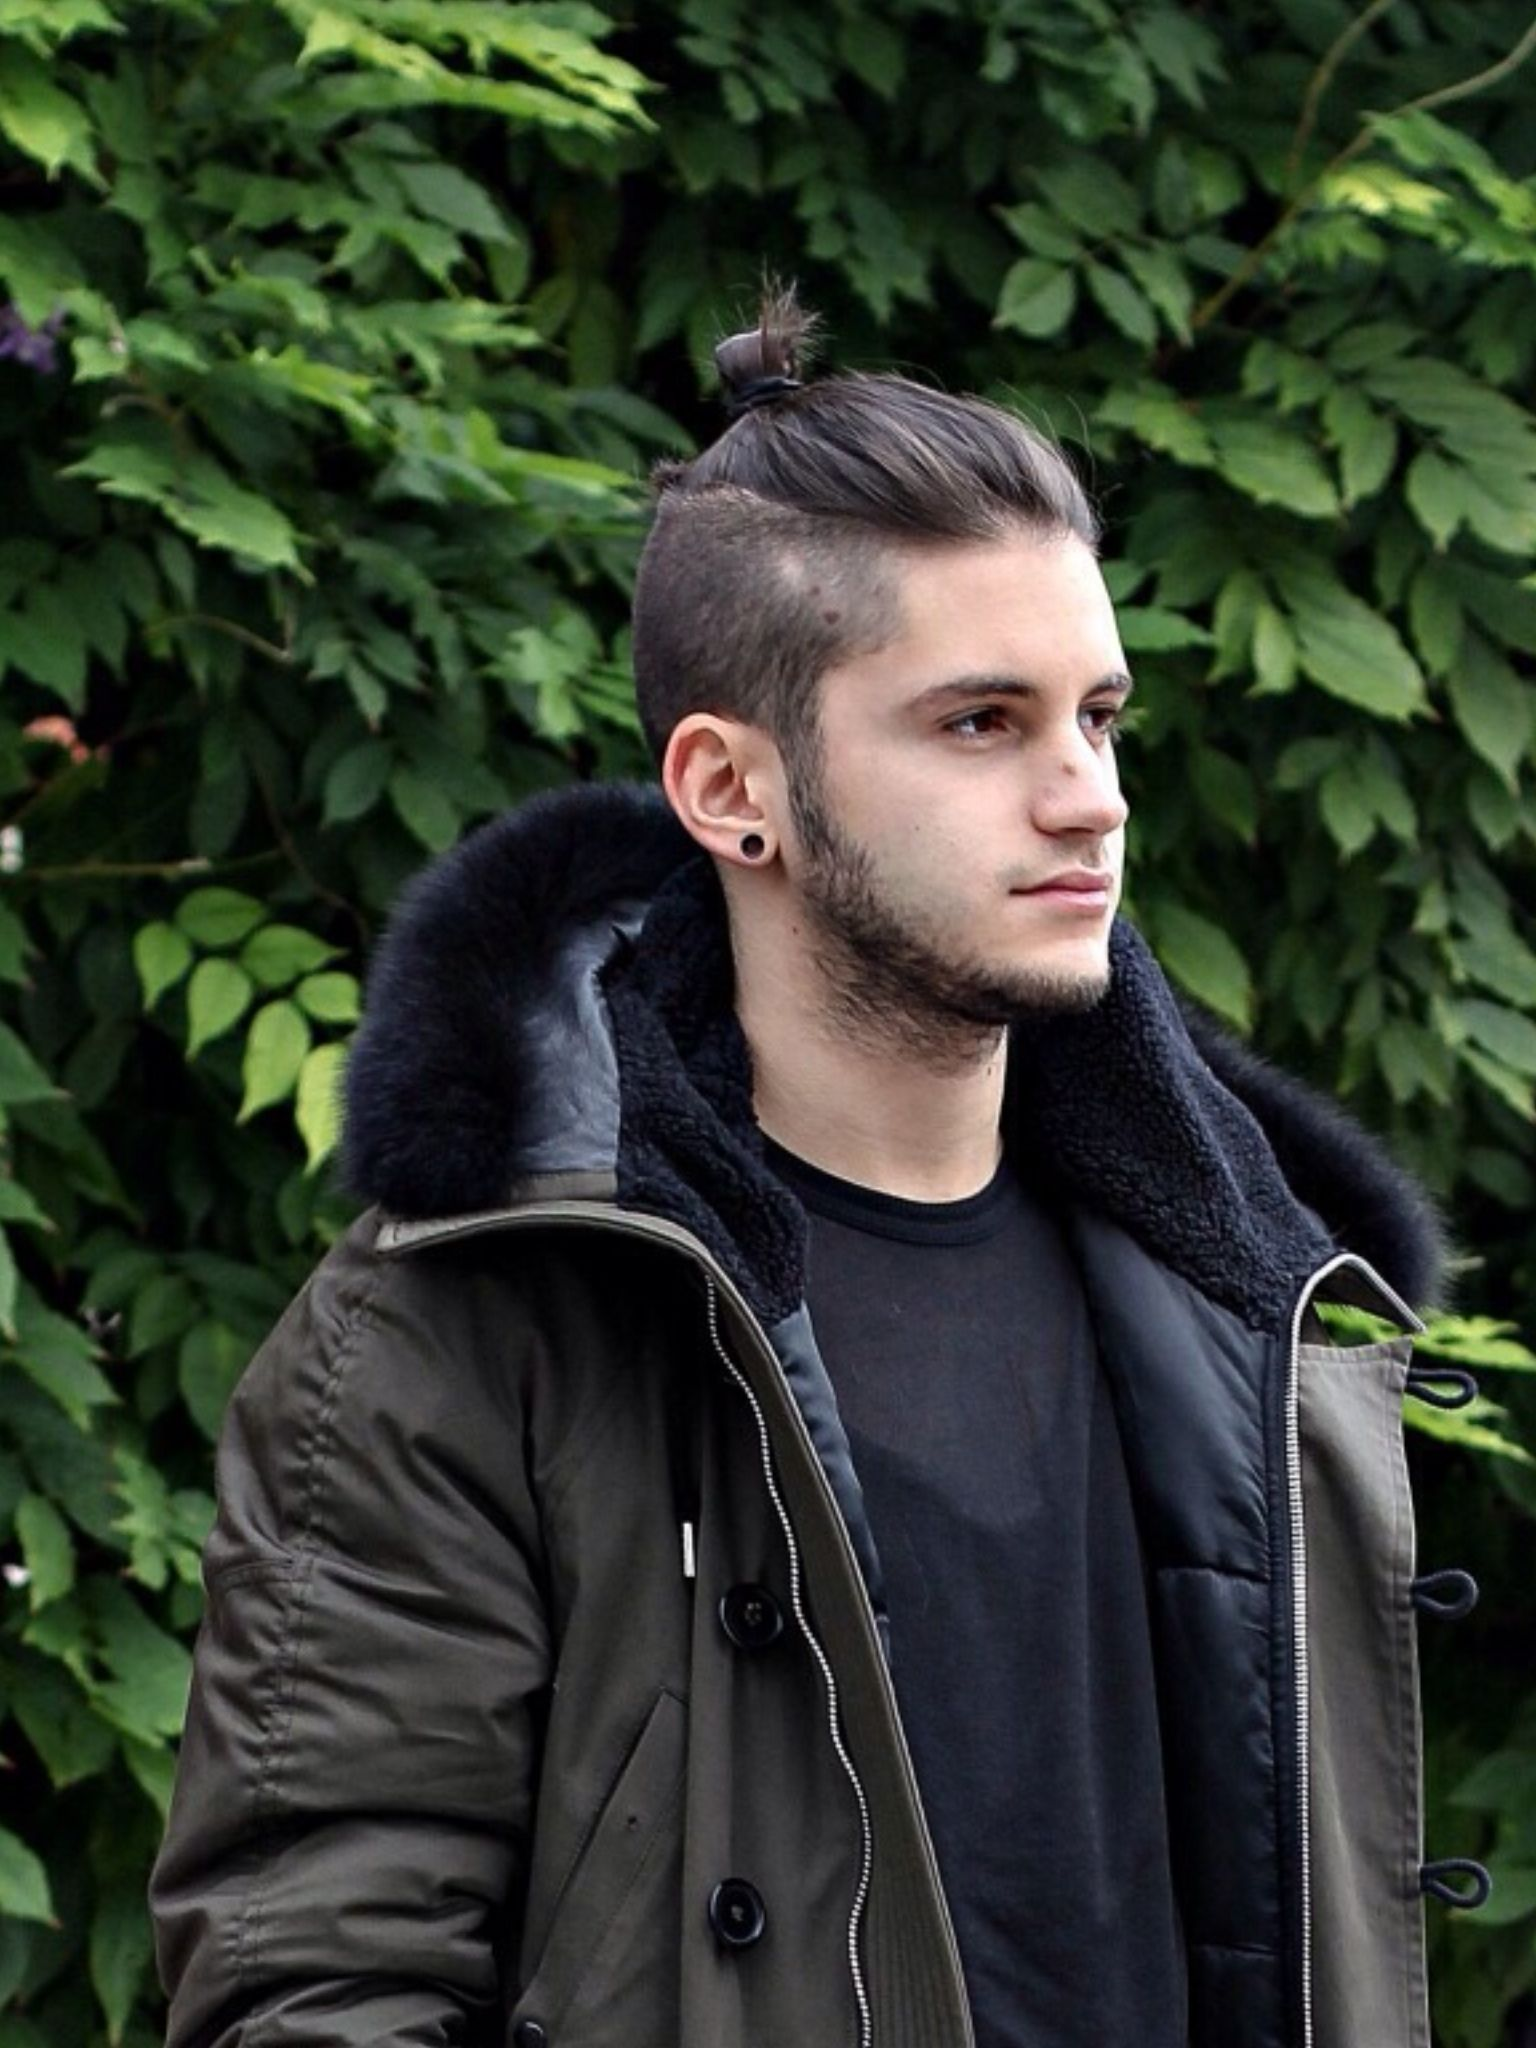 Men S Fashion Hair Man Bun Hairstyles Top Knot Hairstyles Bun Hairstyles